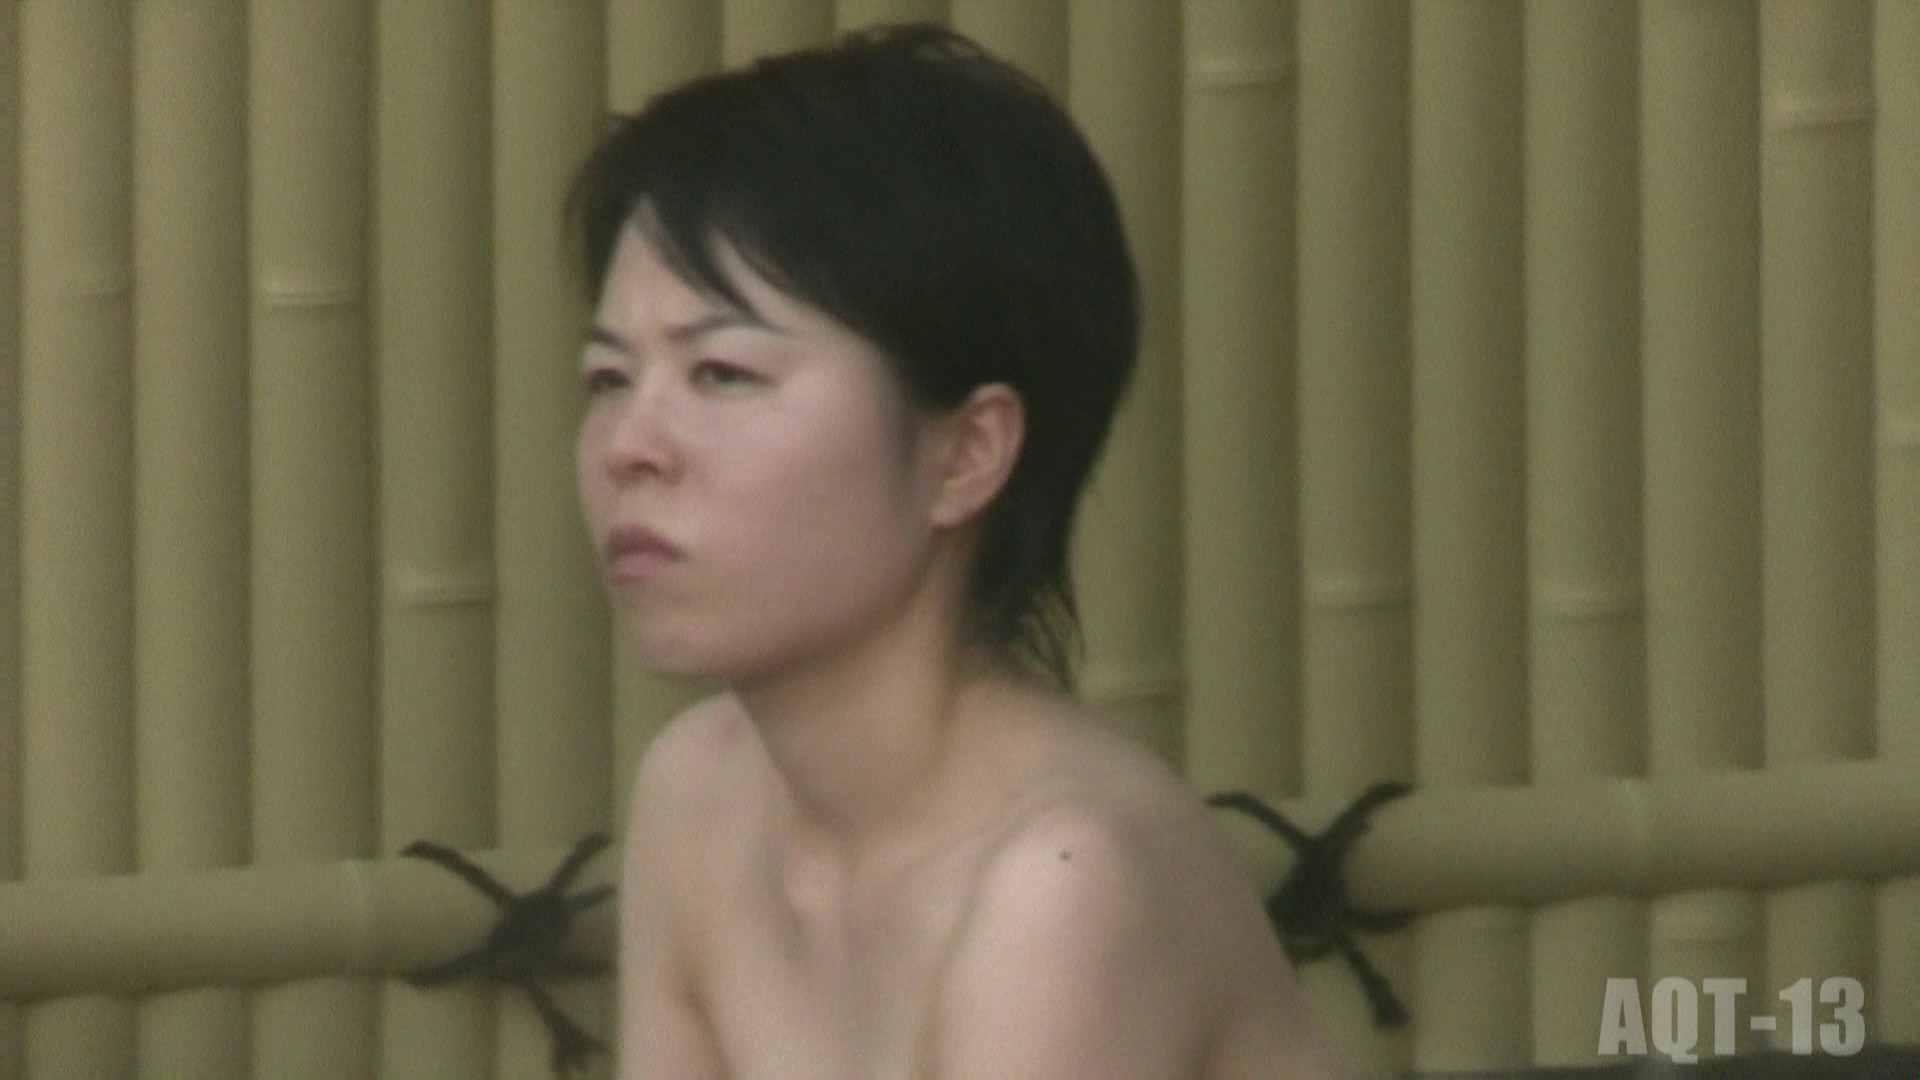 Aquaな露天風呂Vol.815 露天覗き のぞき動画キャプチャ 97枚